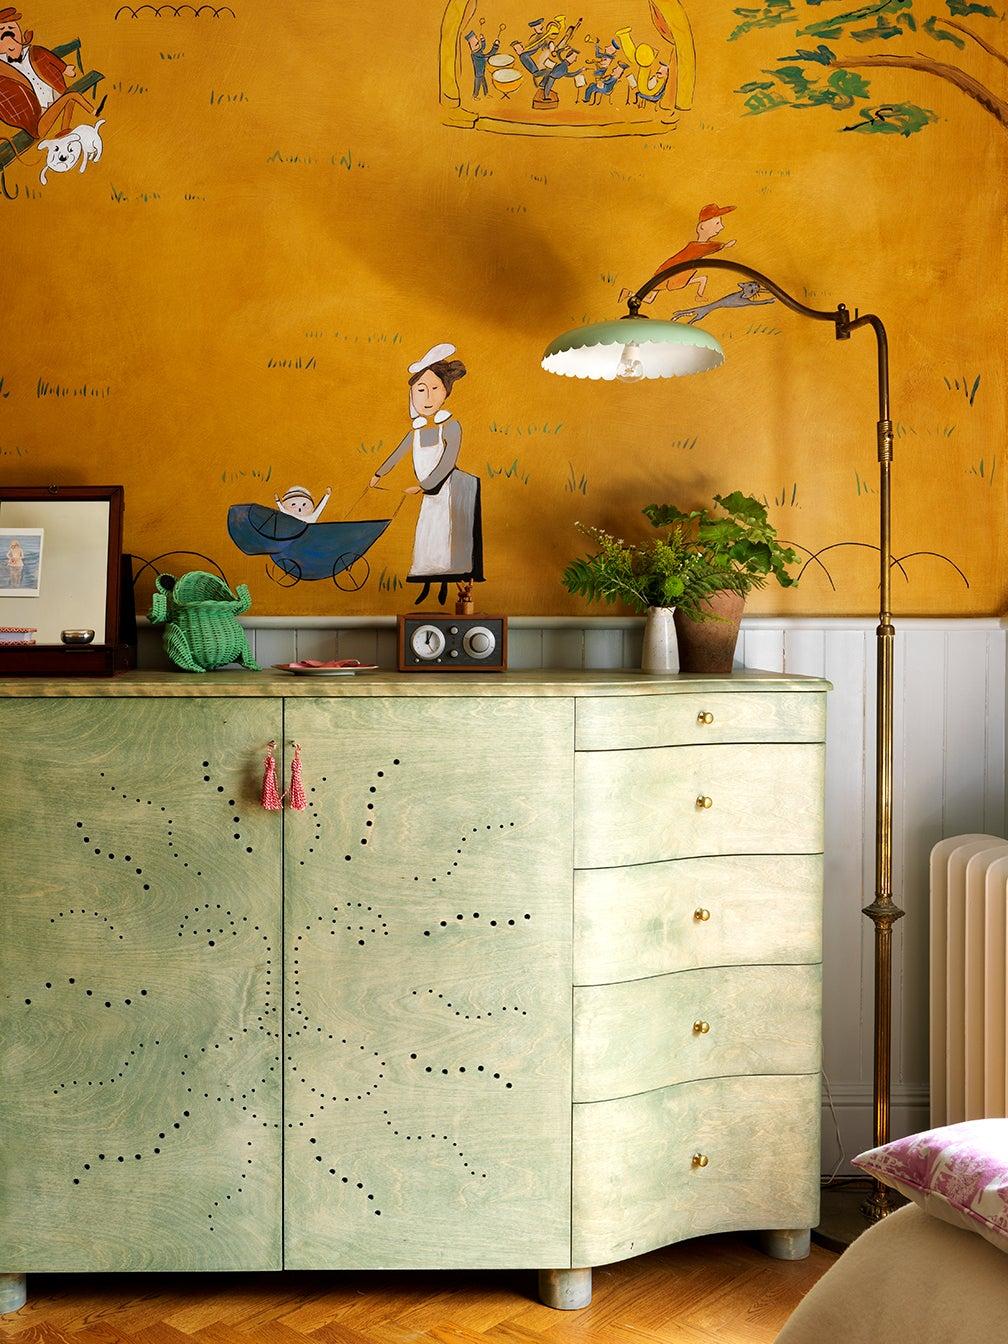 00-FEATURE-Beata-Heuman-kids-design-tips-domino